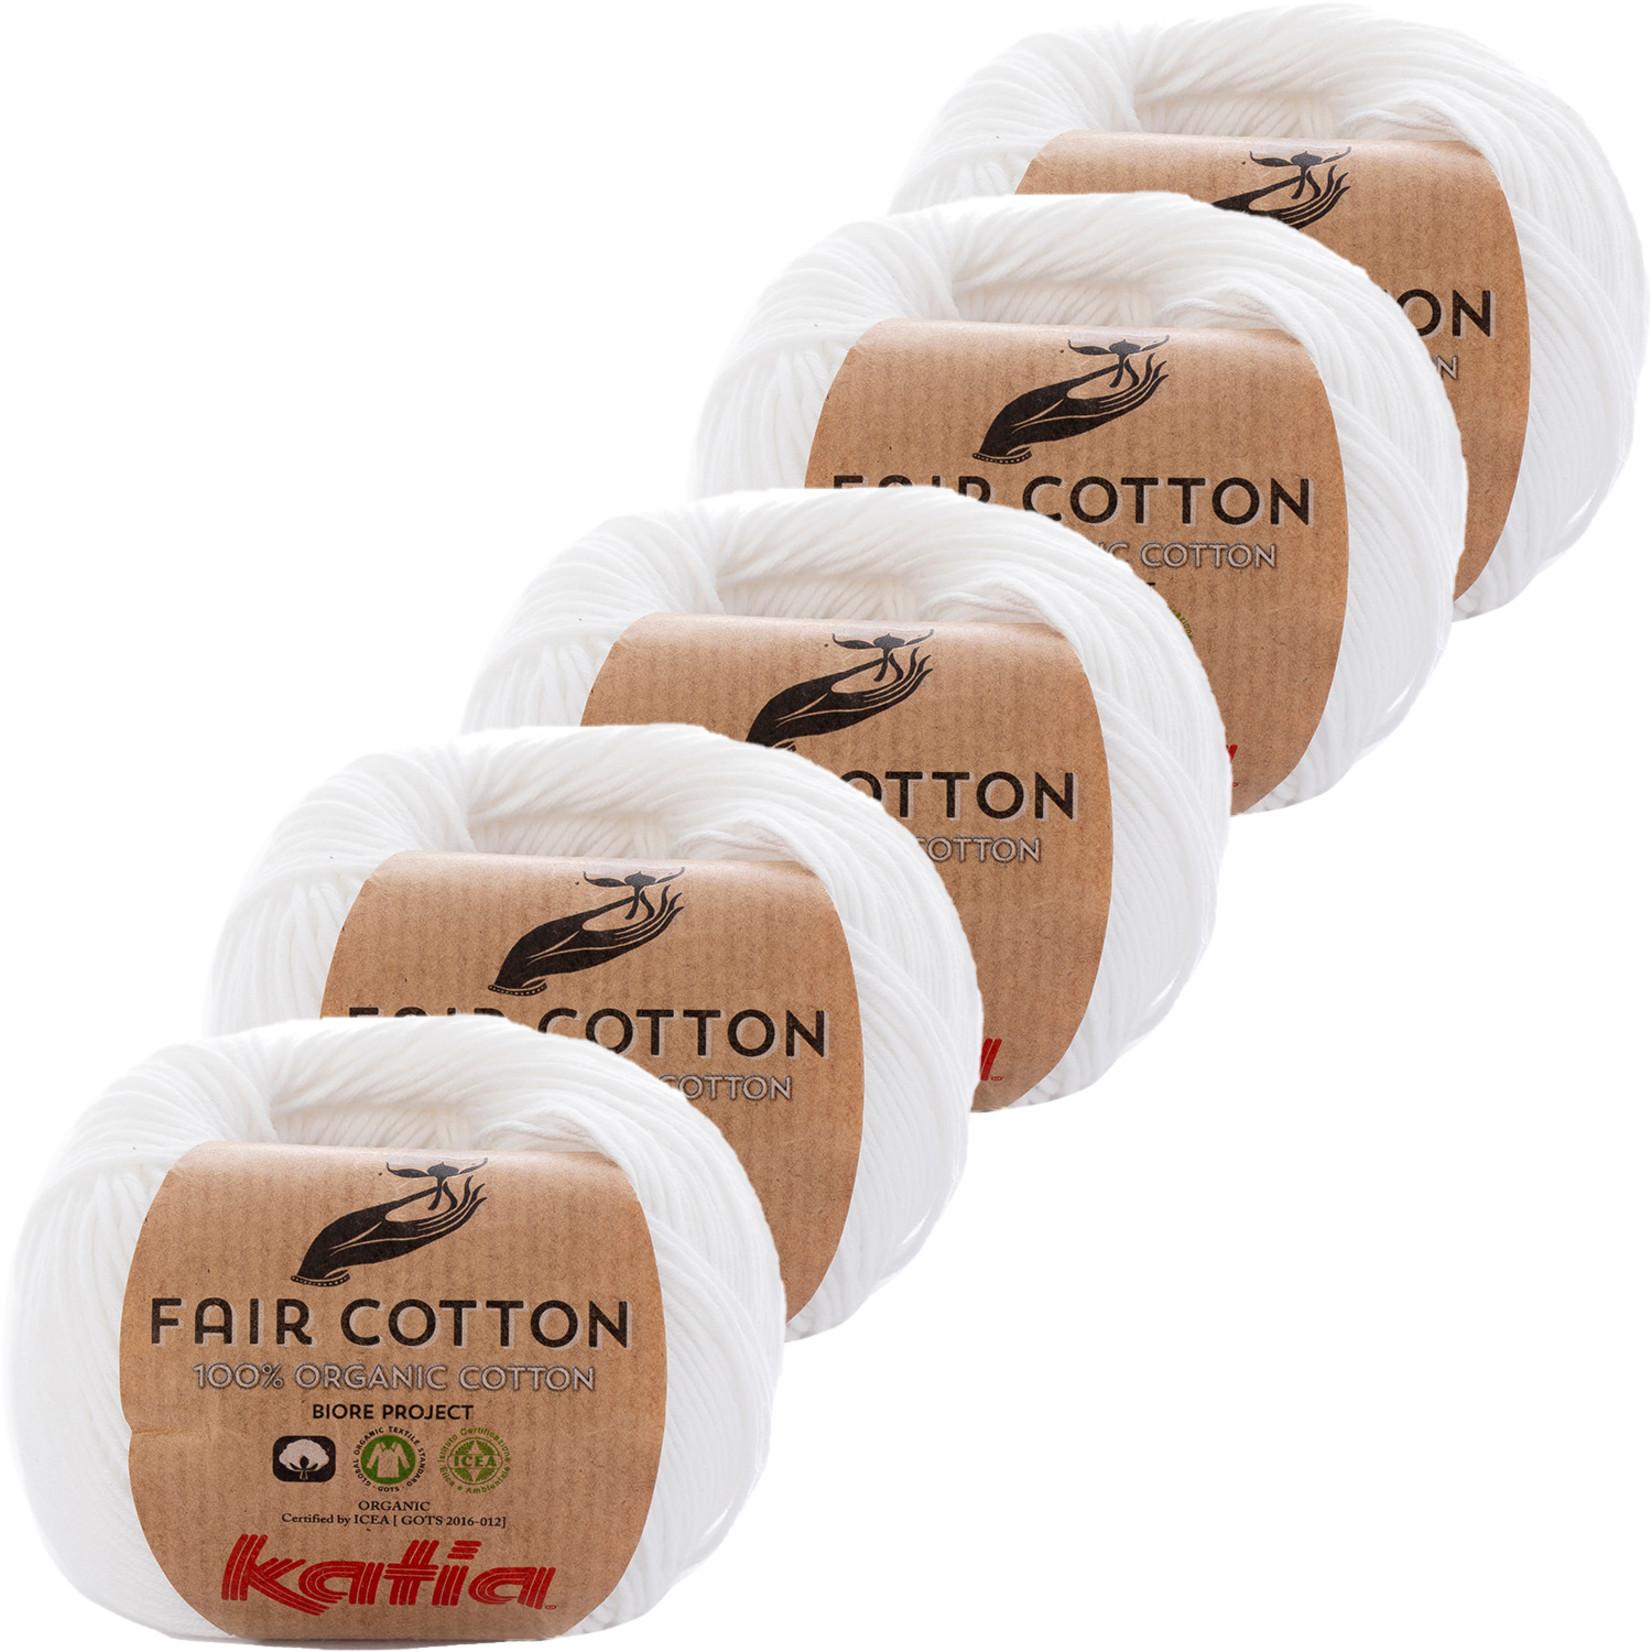 Katia Katia Fair Cotton Kleur 1 - wit - 100% biologisch GOTS katoengaren - 50 gr. = 155 m. - bundel 5 x 50 gr.